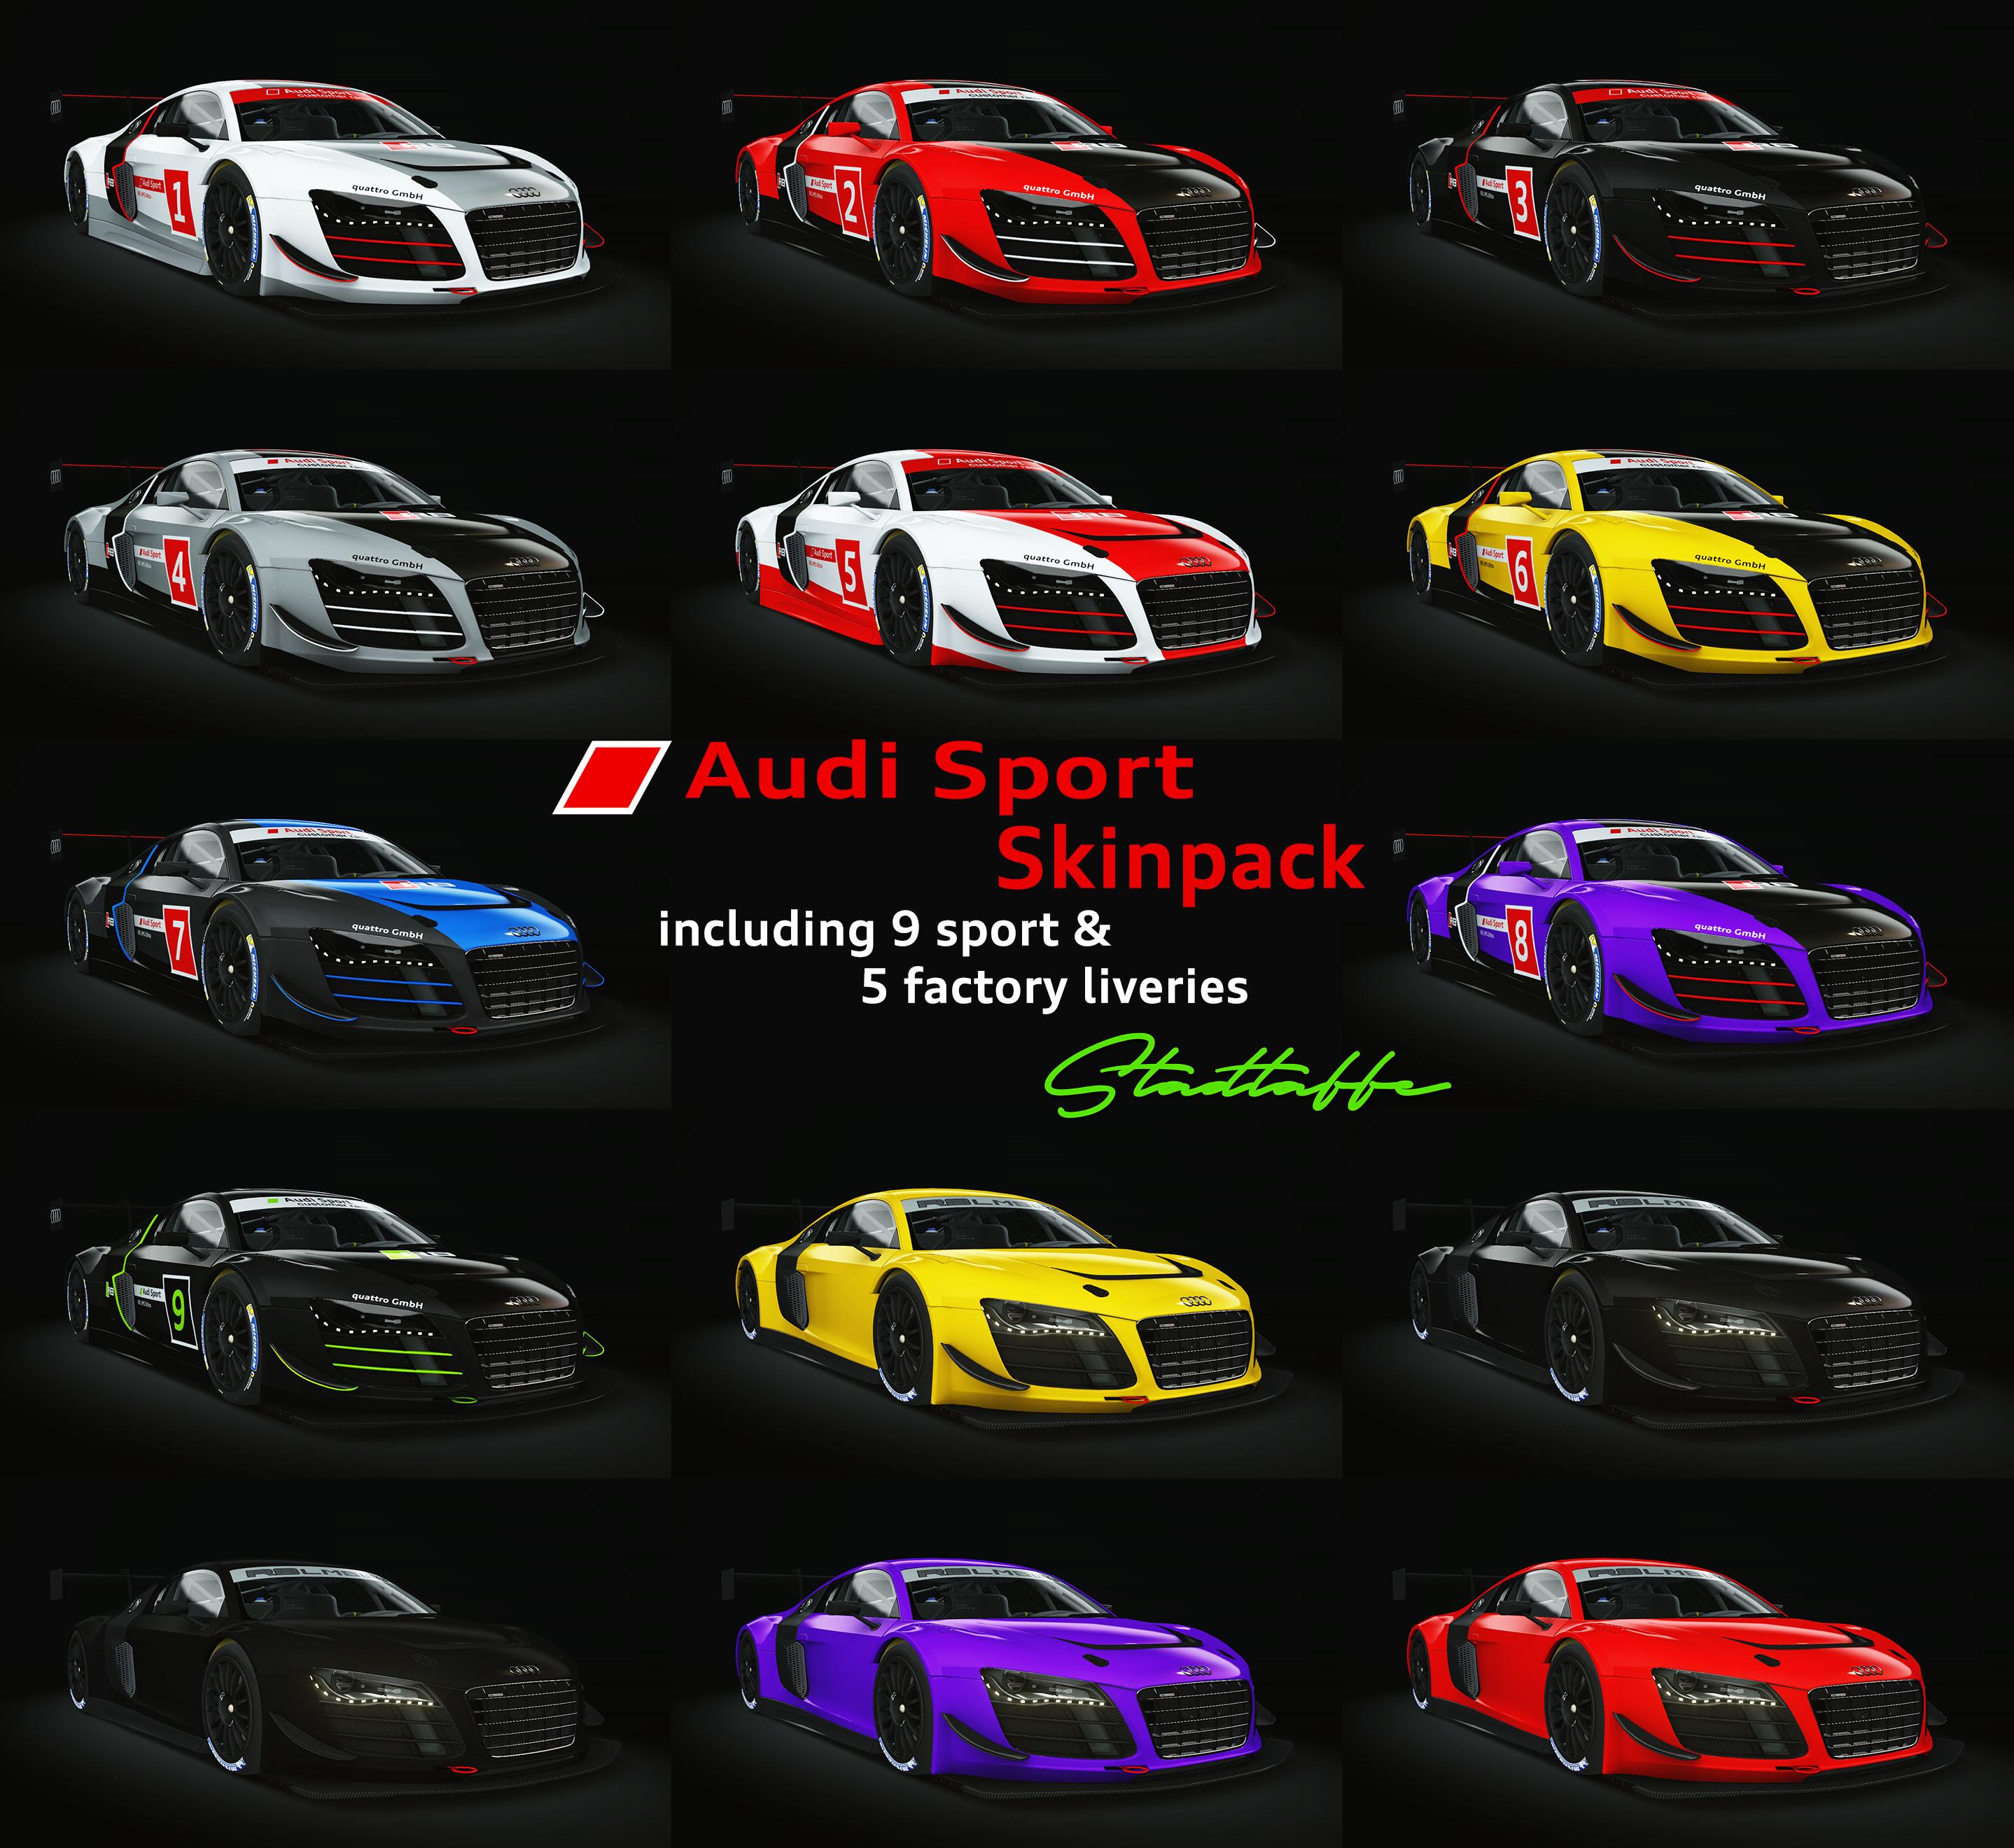 Audi-Sport-Skinpack1.jpg